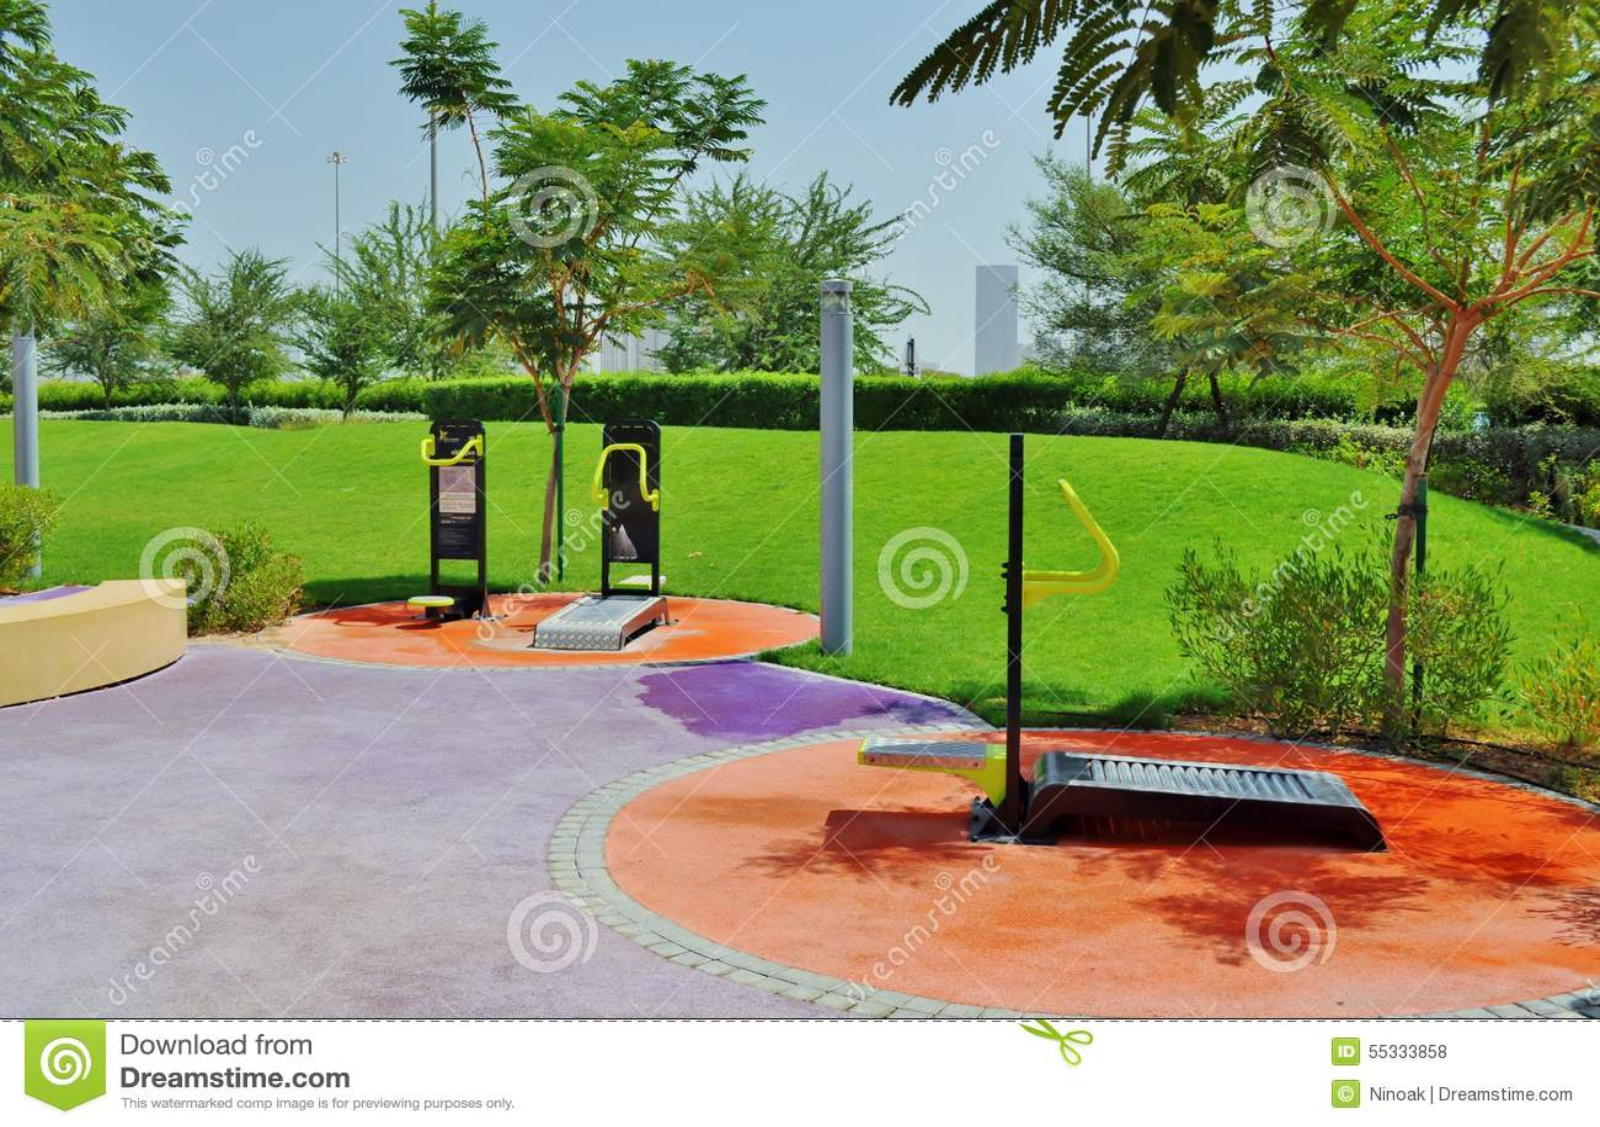 Парк Delma - характеристики спортзала